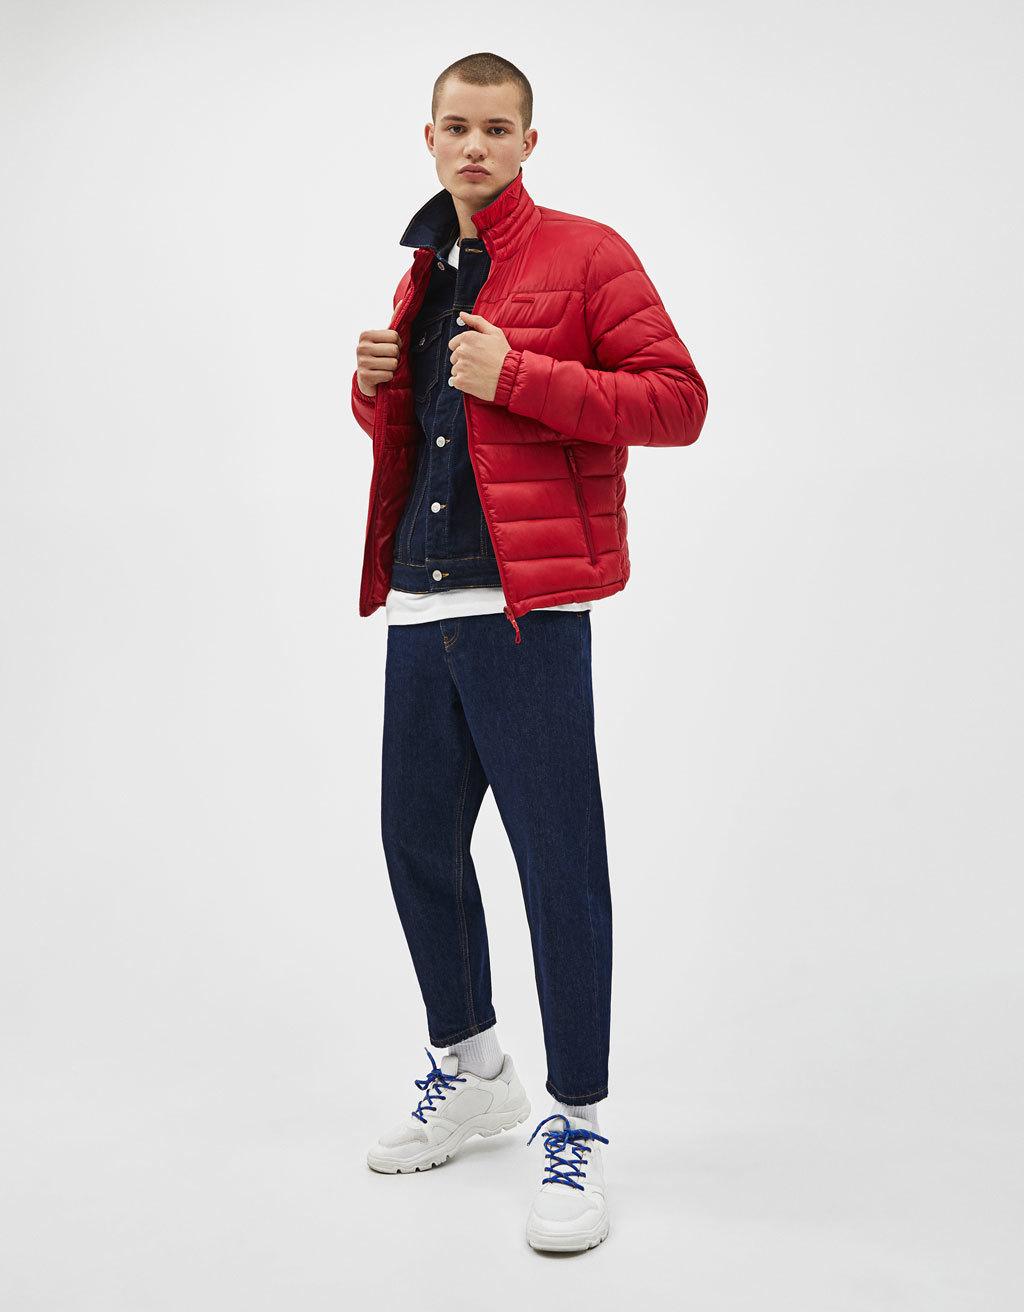 d3377e17a5 Men's Red Puffer Jacket, Navy Denim Jacket, White Crew-neck T-shirt, Navy  Jeans   Men's Fashion   Lookastic.com